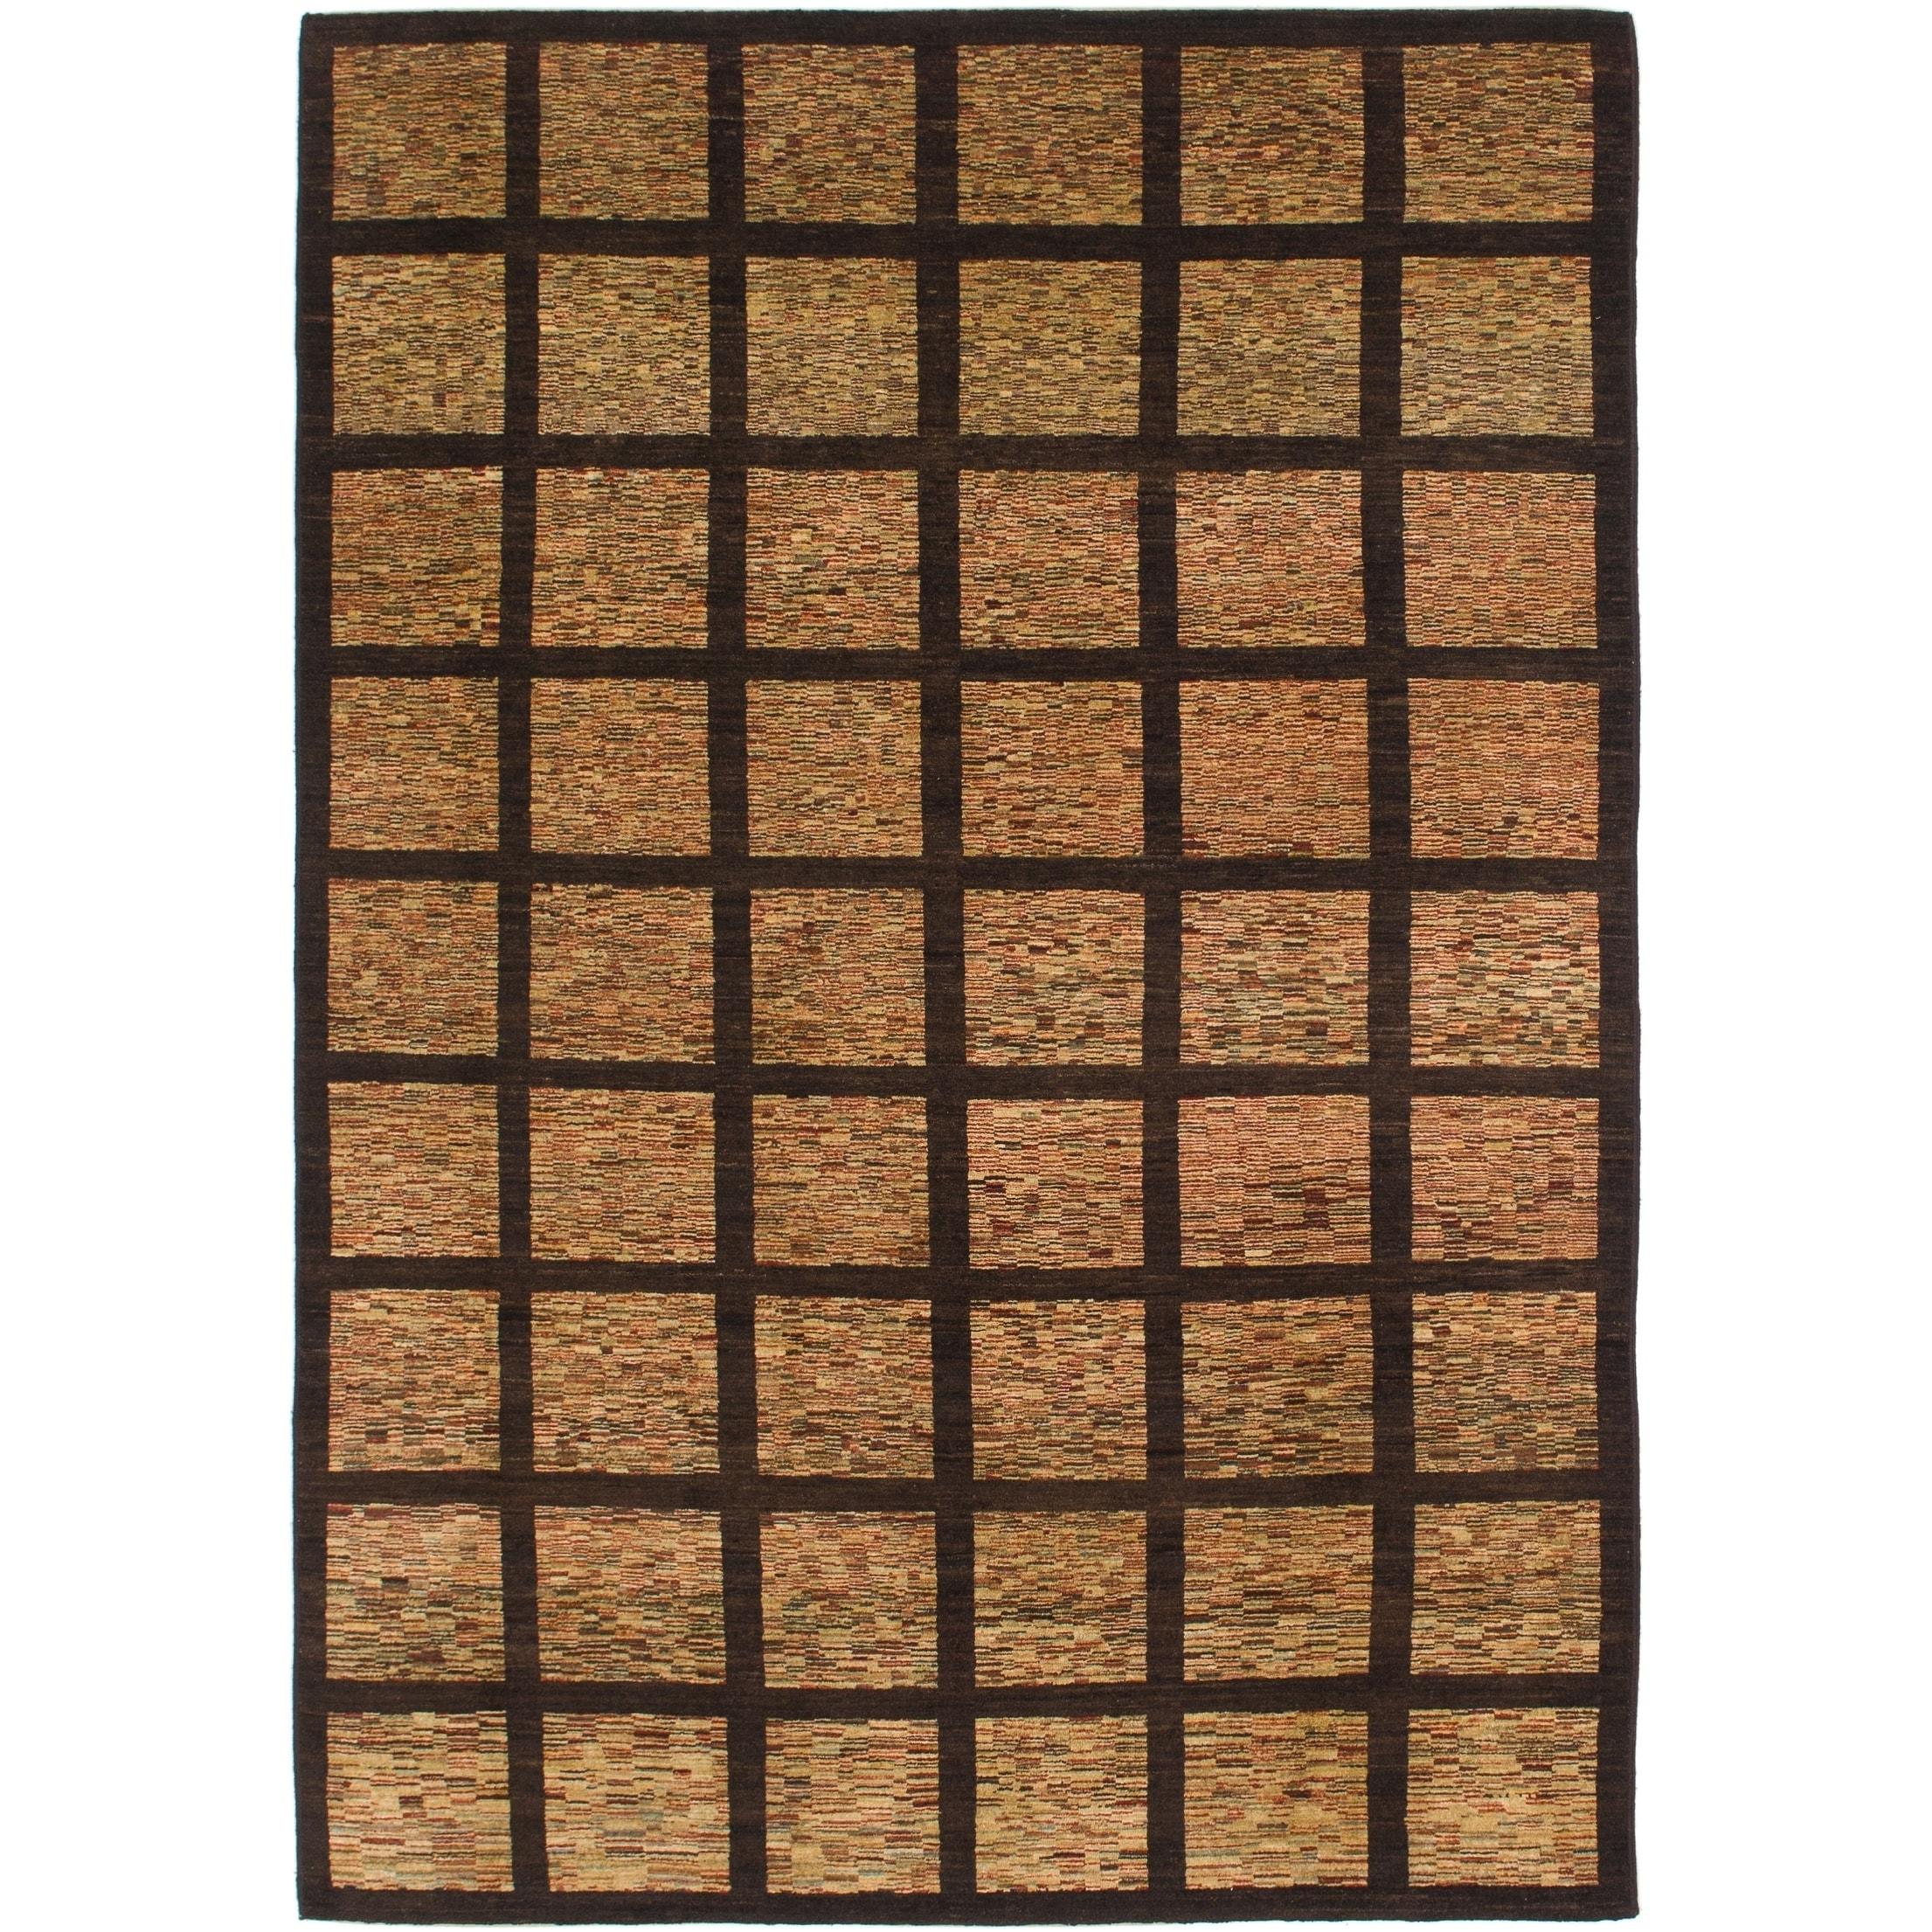 Hand Knotted Kashkuli Gabbeh Wool Area Rug - 6 4 x 9 5 (Maroon - 6 4 x 9 5)